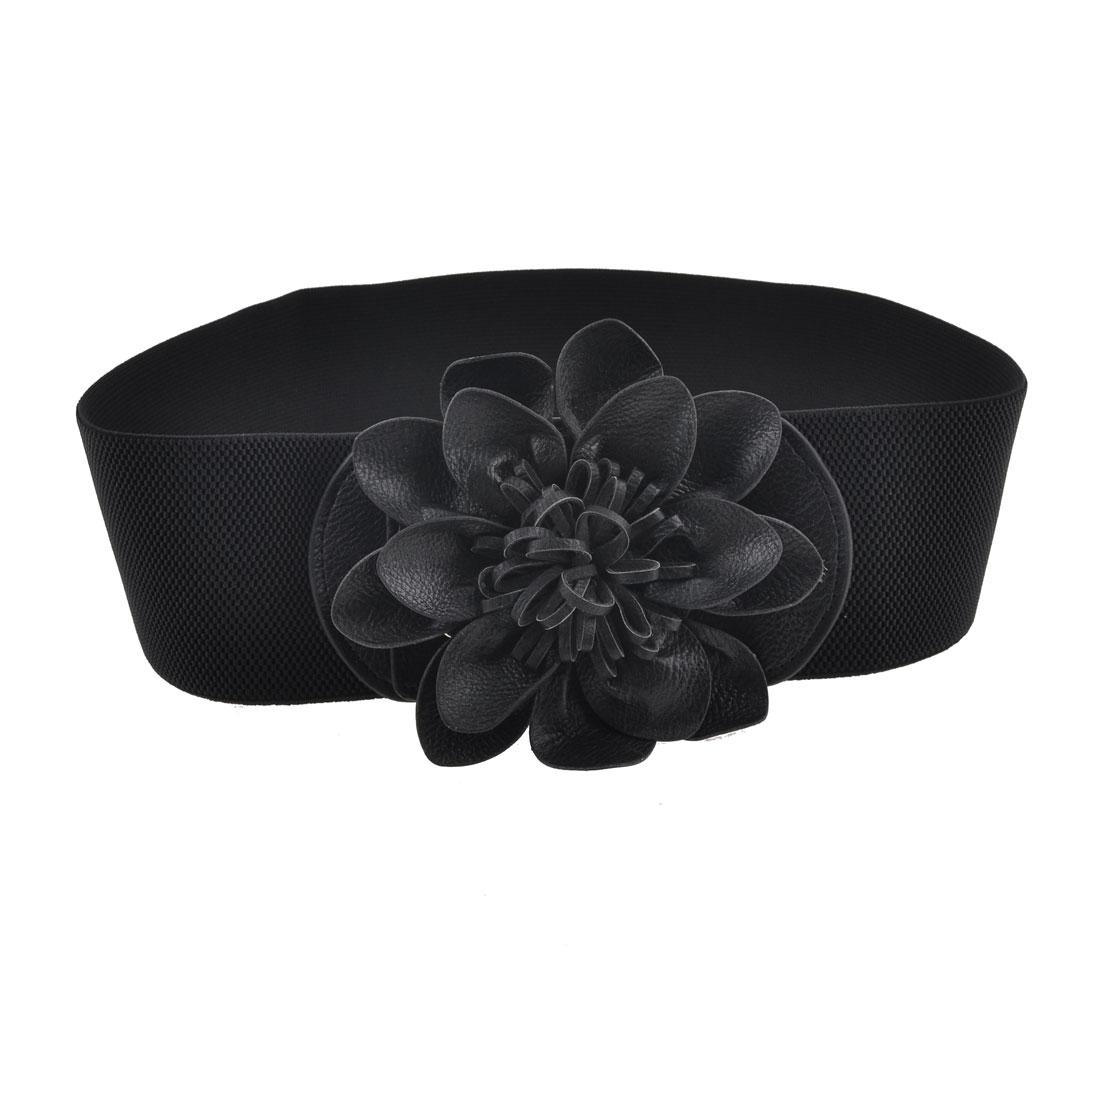 Woman Faux Leather Floral Decor Metal Press Stud Buckle Elastic Waist Belt Black